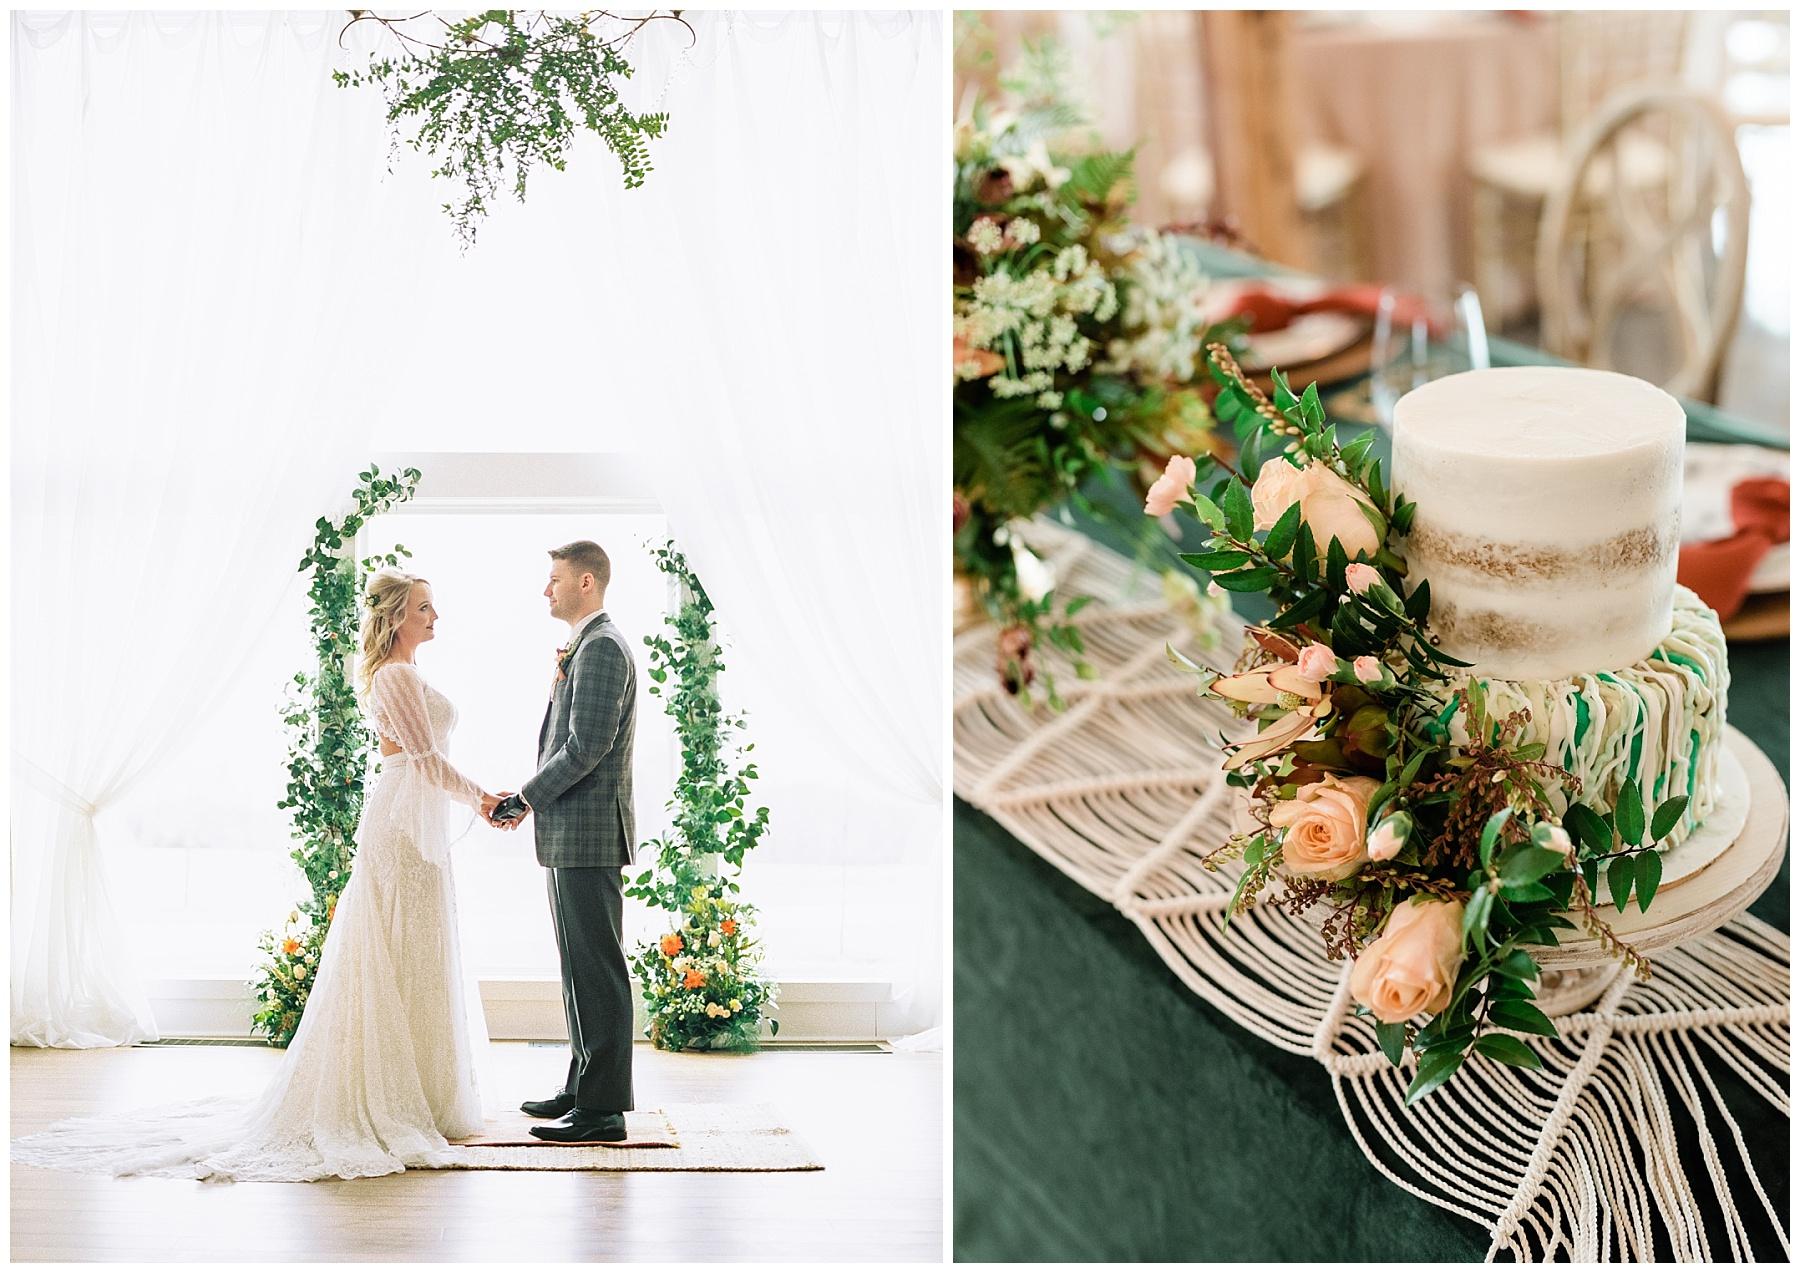 Eclectic Scandinavian Winter Wedding in All White Venue Emerson Fields by Kelsi Kliethermes Photography Best Missouri and Maui Wedding Photographer_0074.jpg